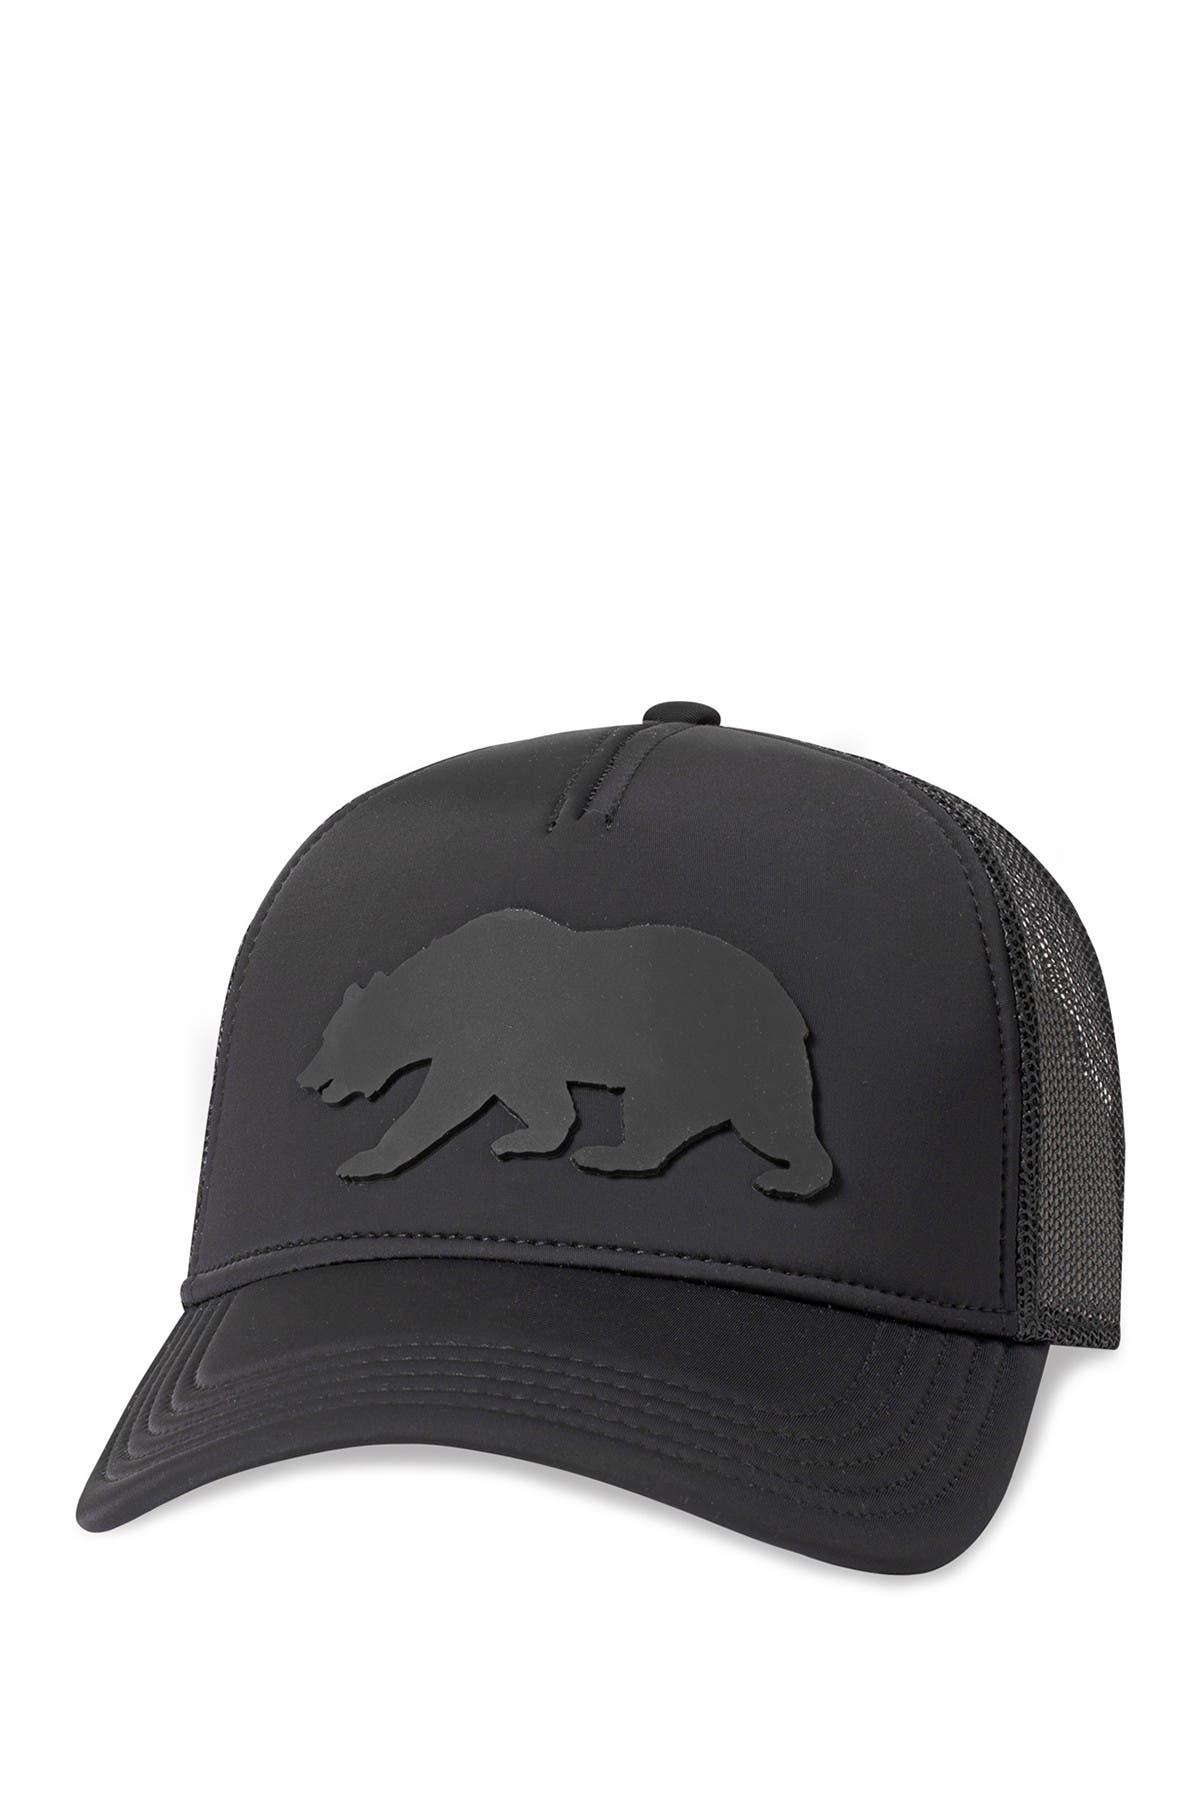 RQJOPE Baseball cap dad hat//Nomad//Skull Embroidery Hat Dark Blue Baseball CapFashionable classic outdoor sports breathable